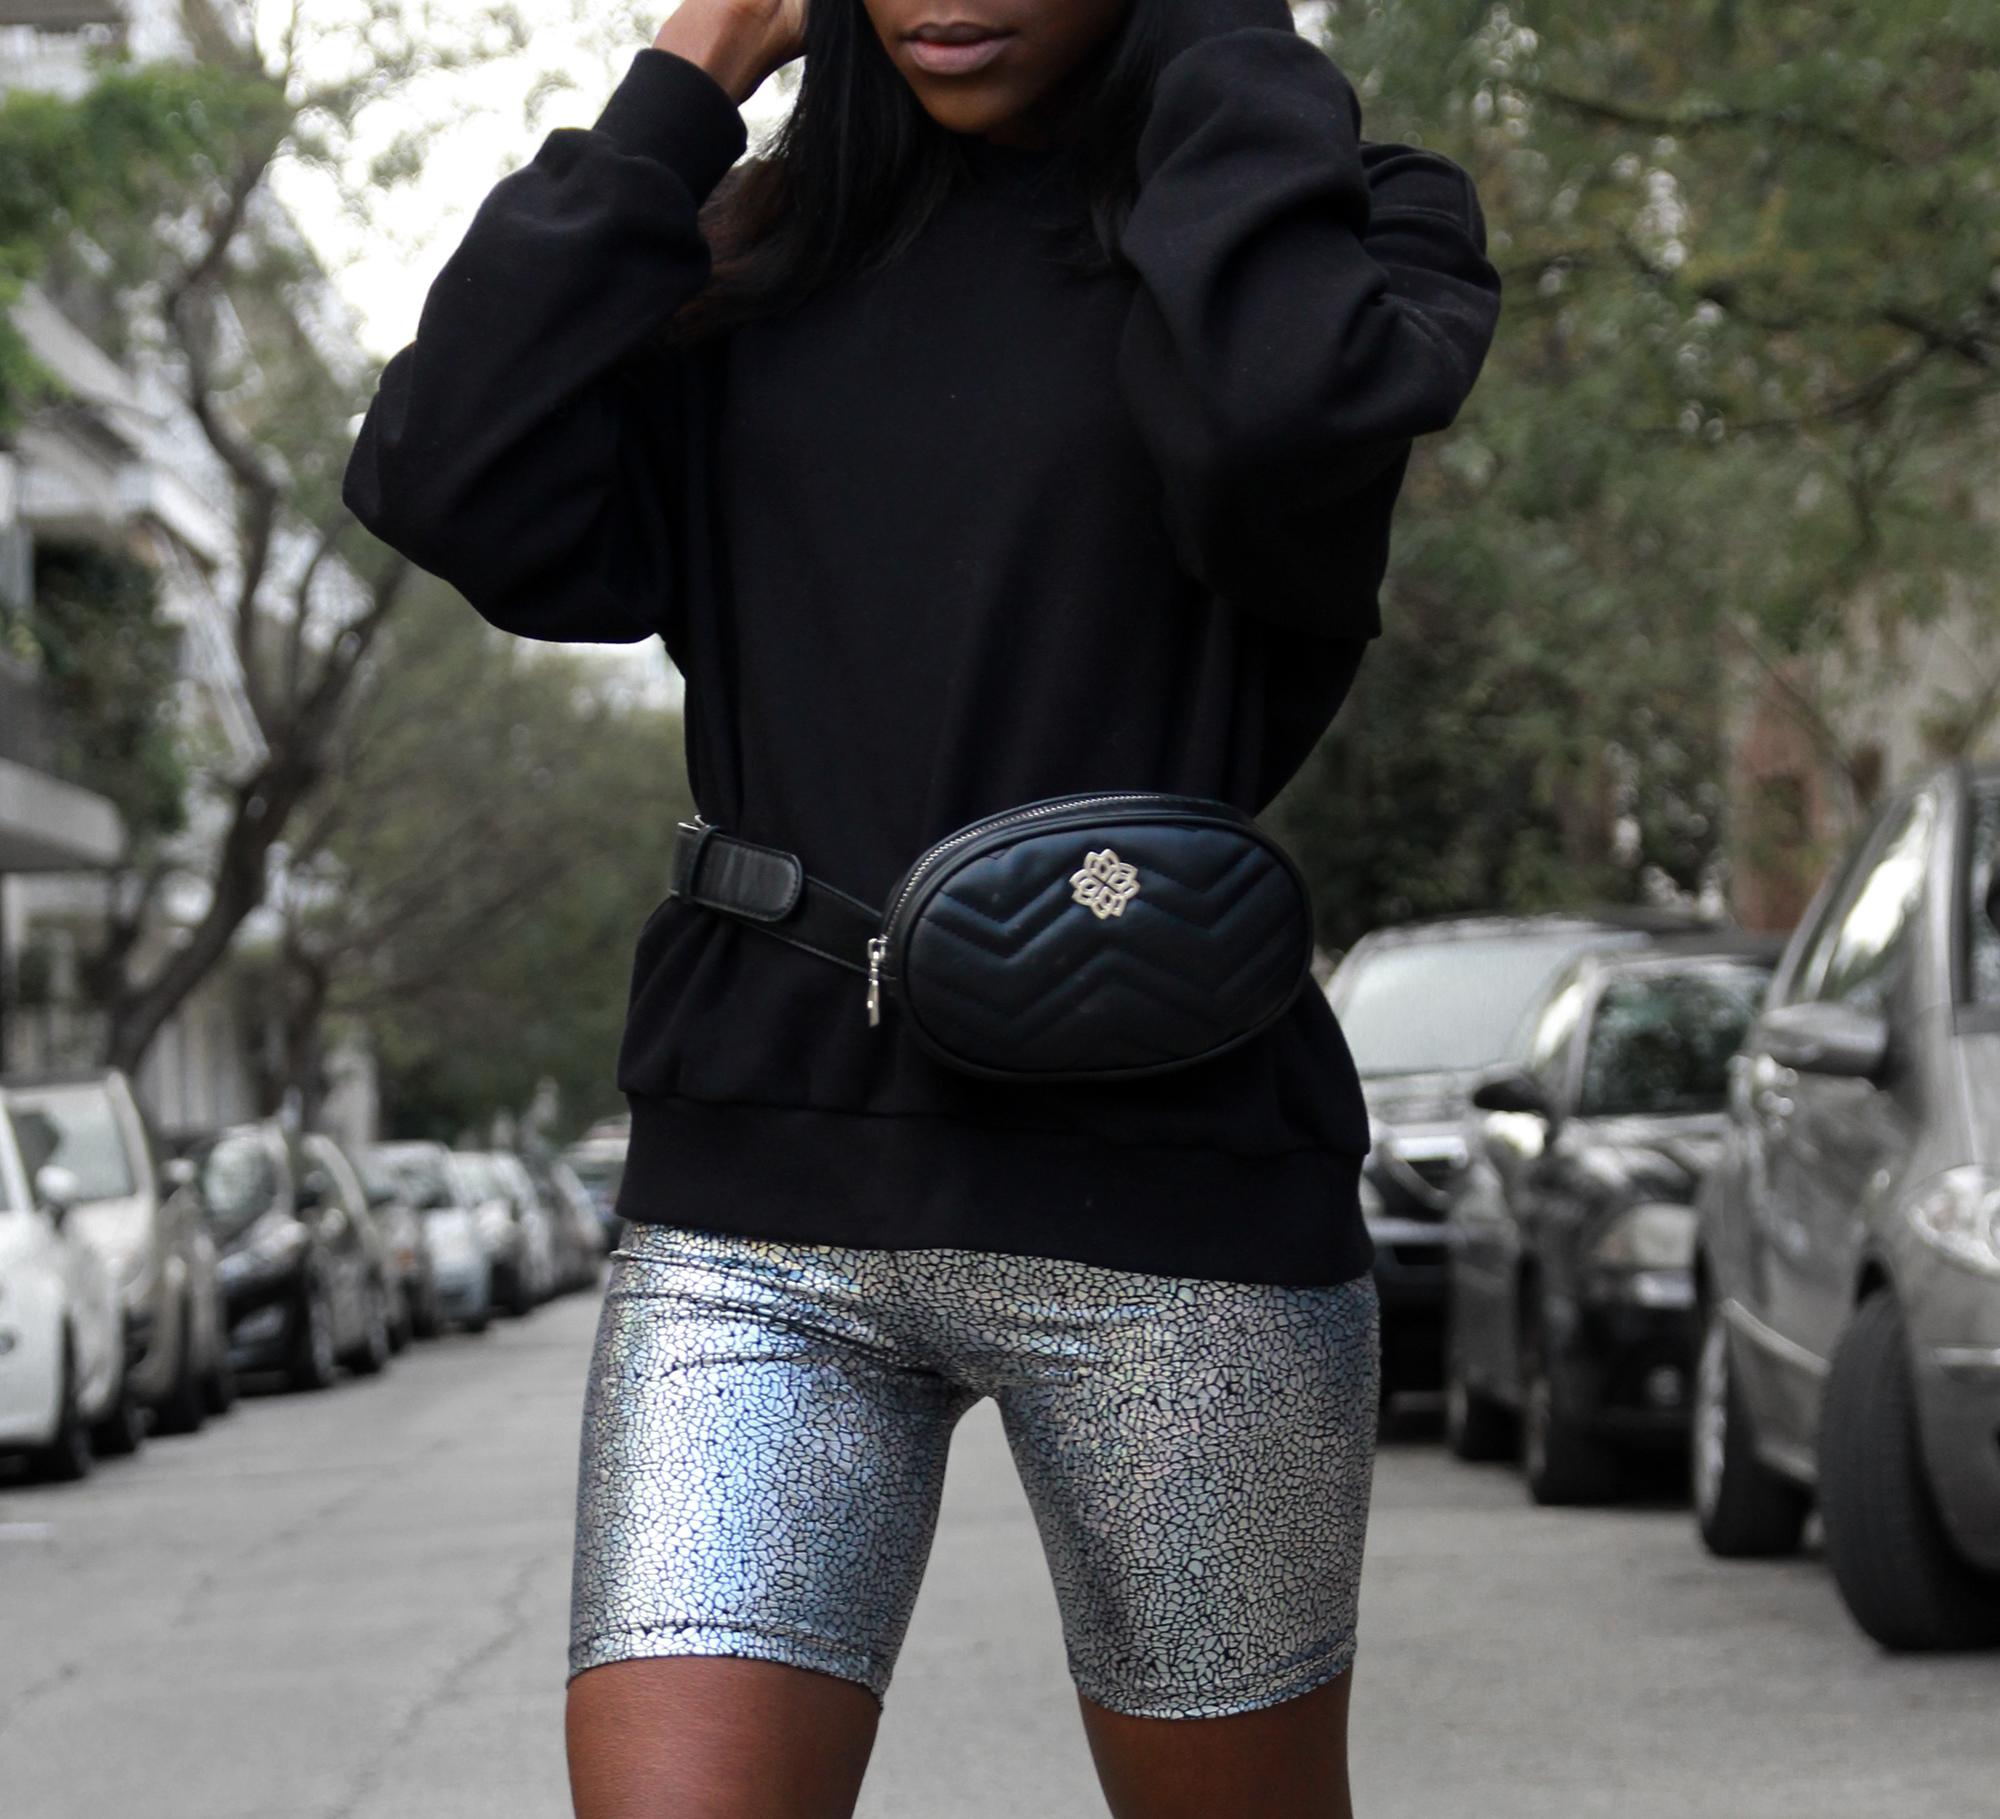 how-to-wear-biker-shorts